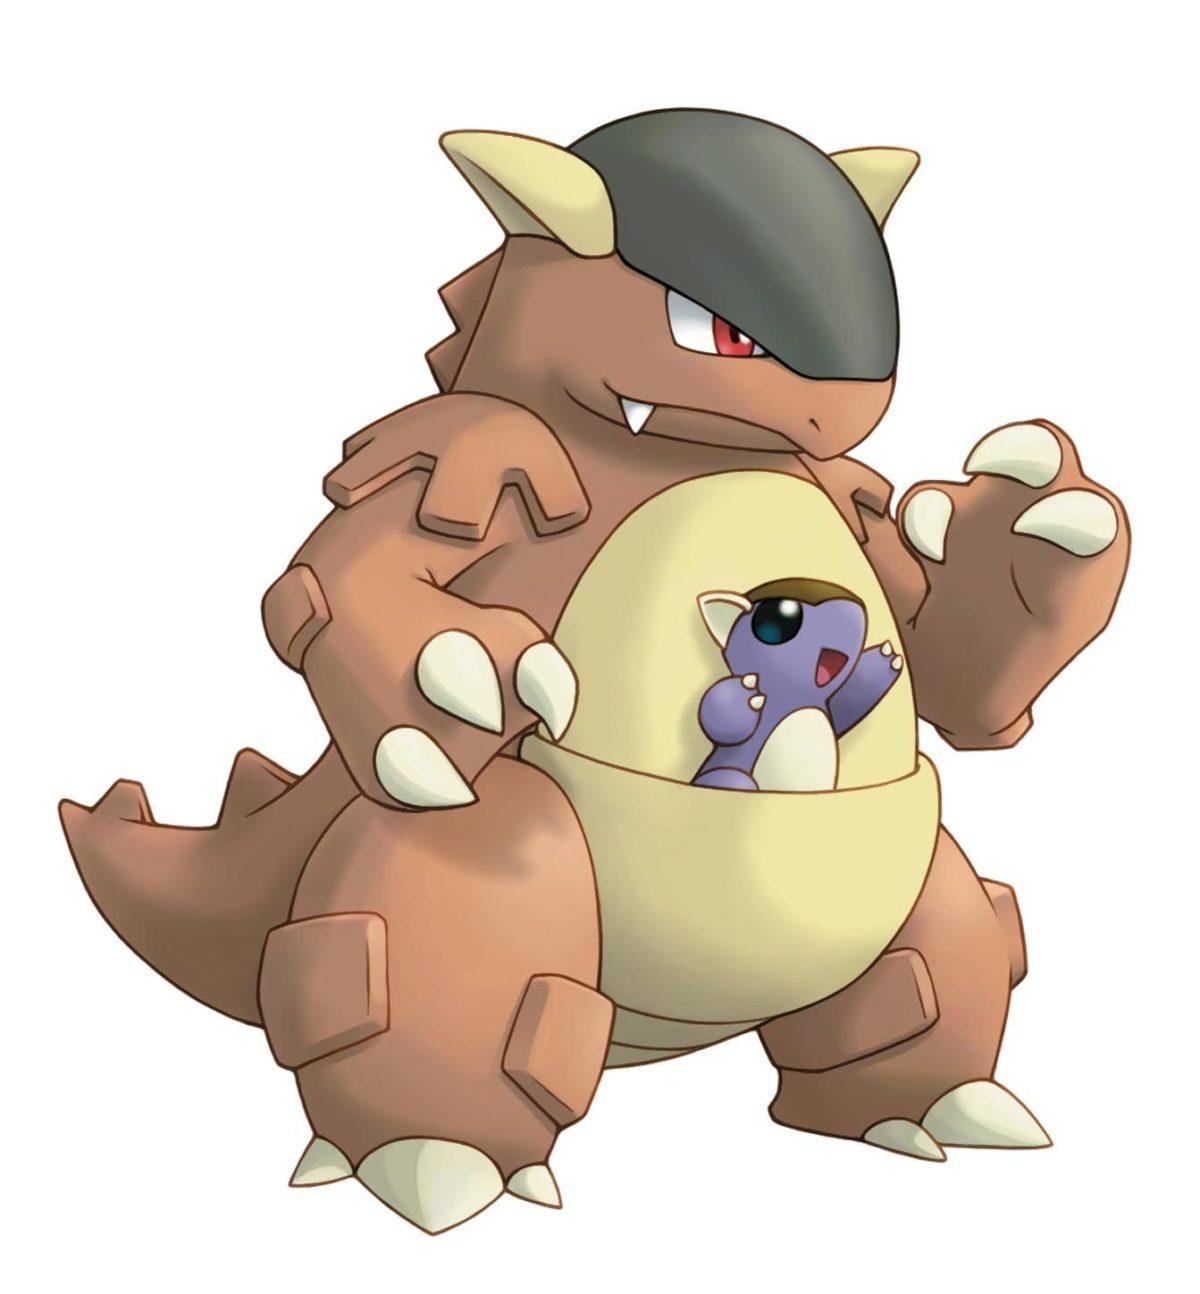 Pokémon by Review: #115: Kangaskhan